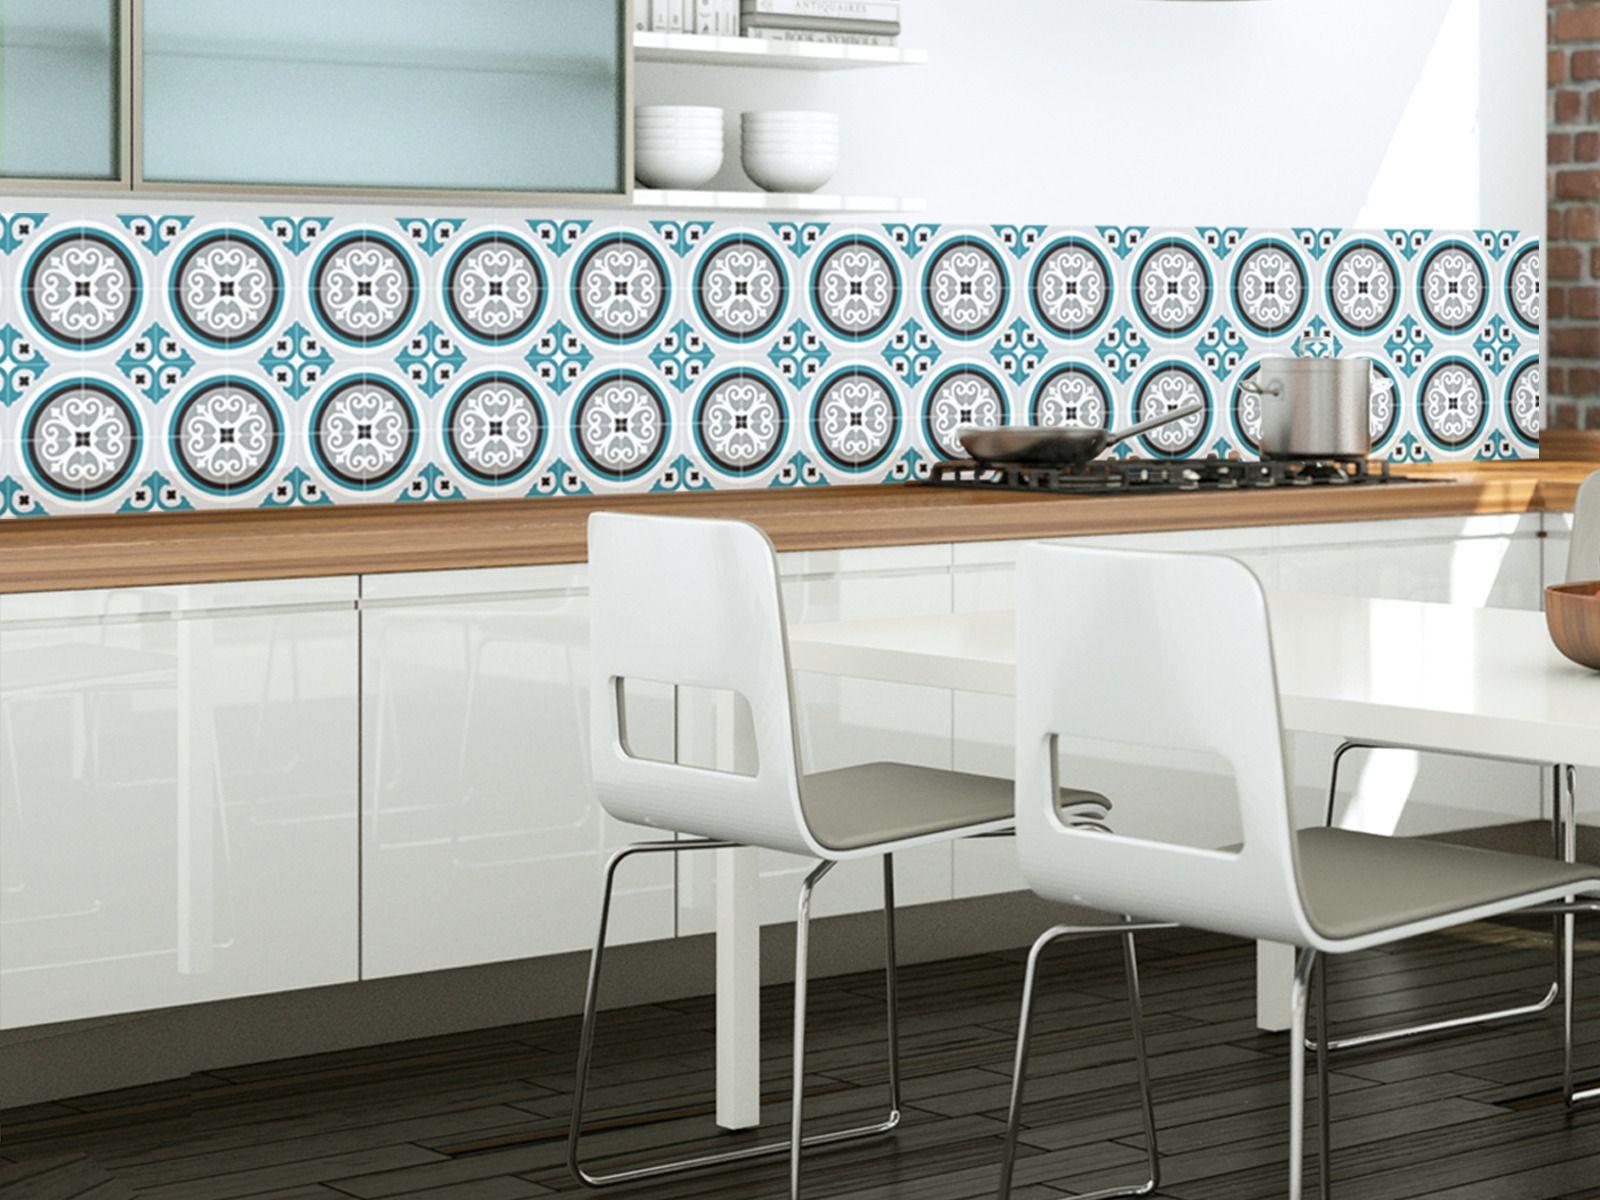 rosace bleu paon cr dence adh sive imperm abilis e. Black Bedroom Furniture Sets. Home Design Ideas